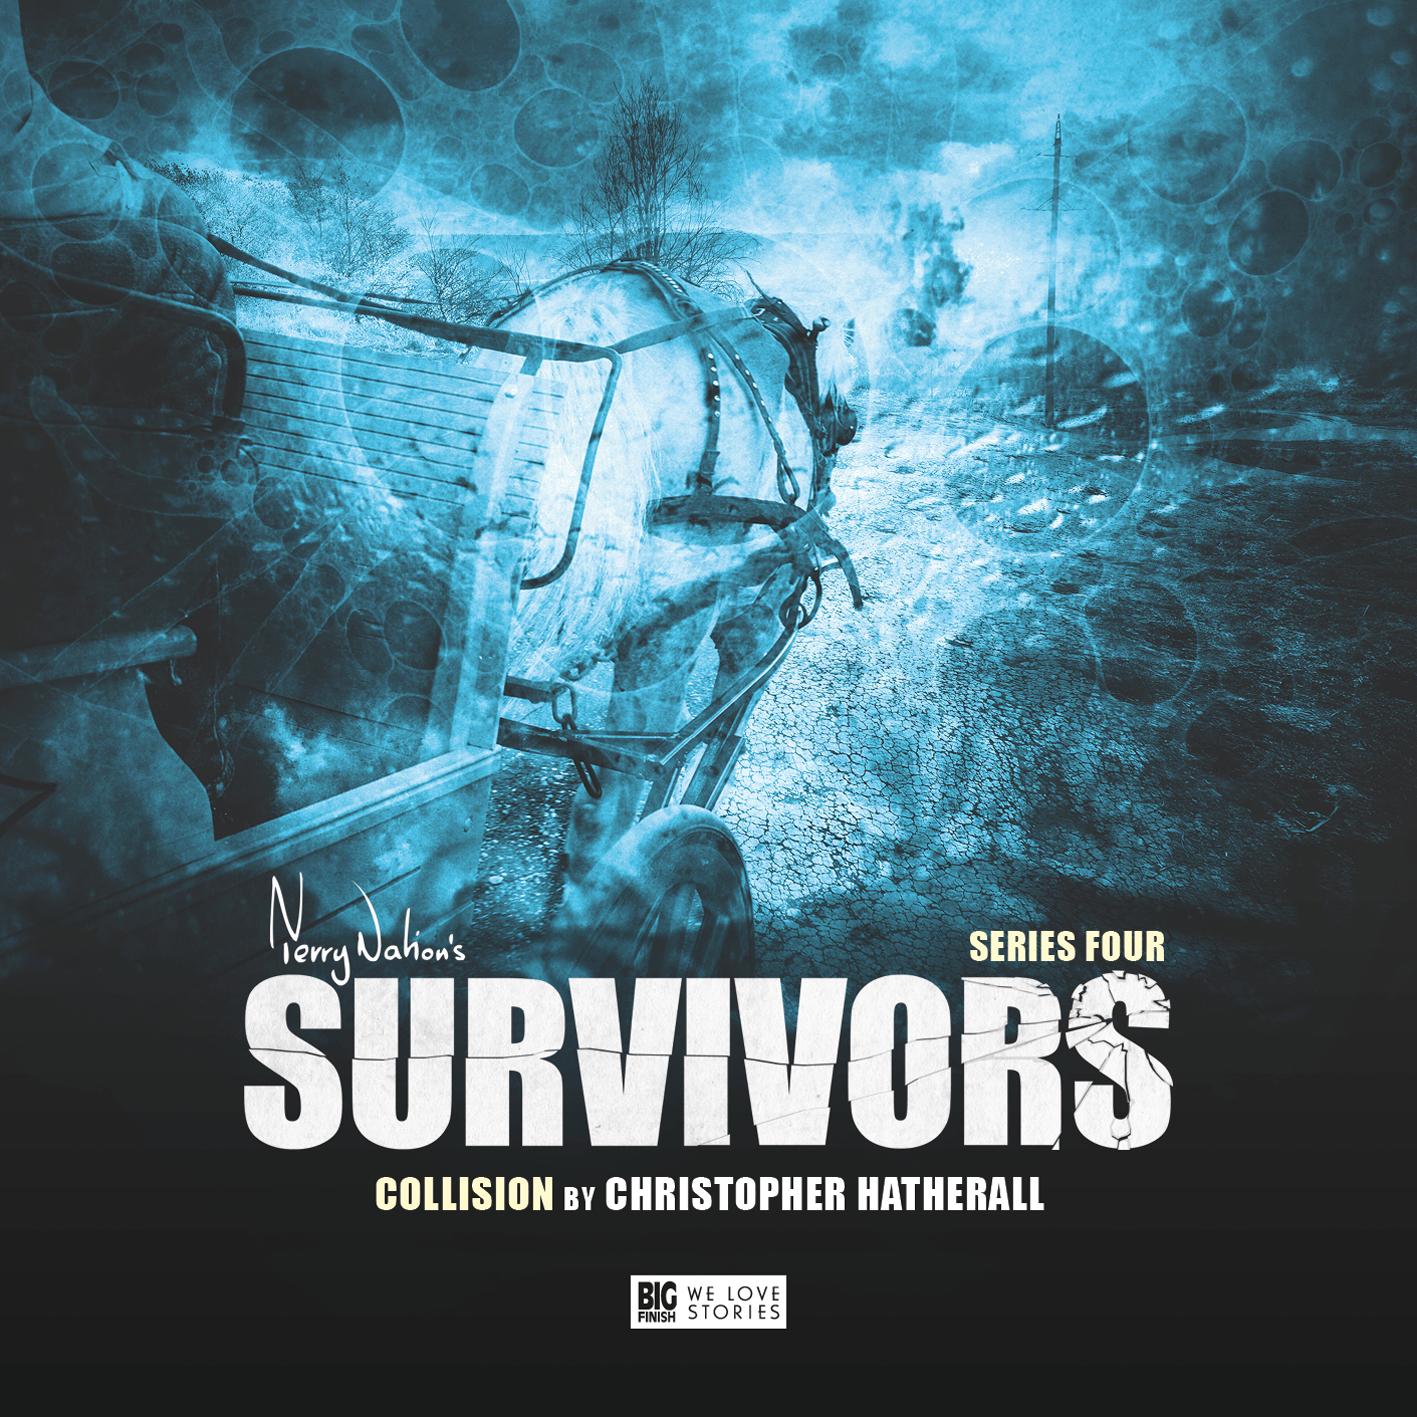 Episode image for Survivors 4:3 Collision